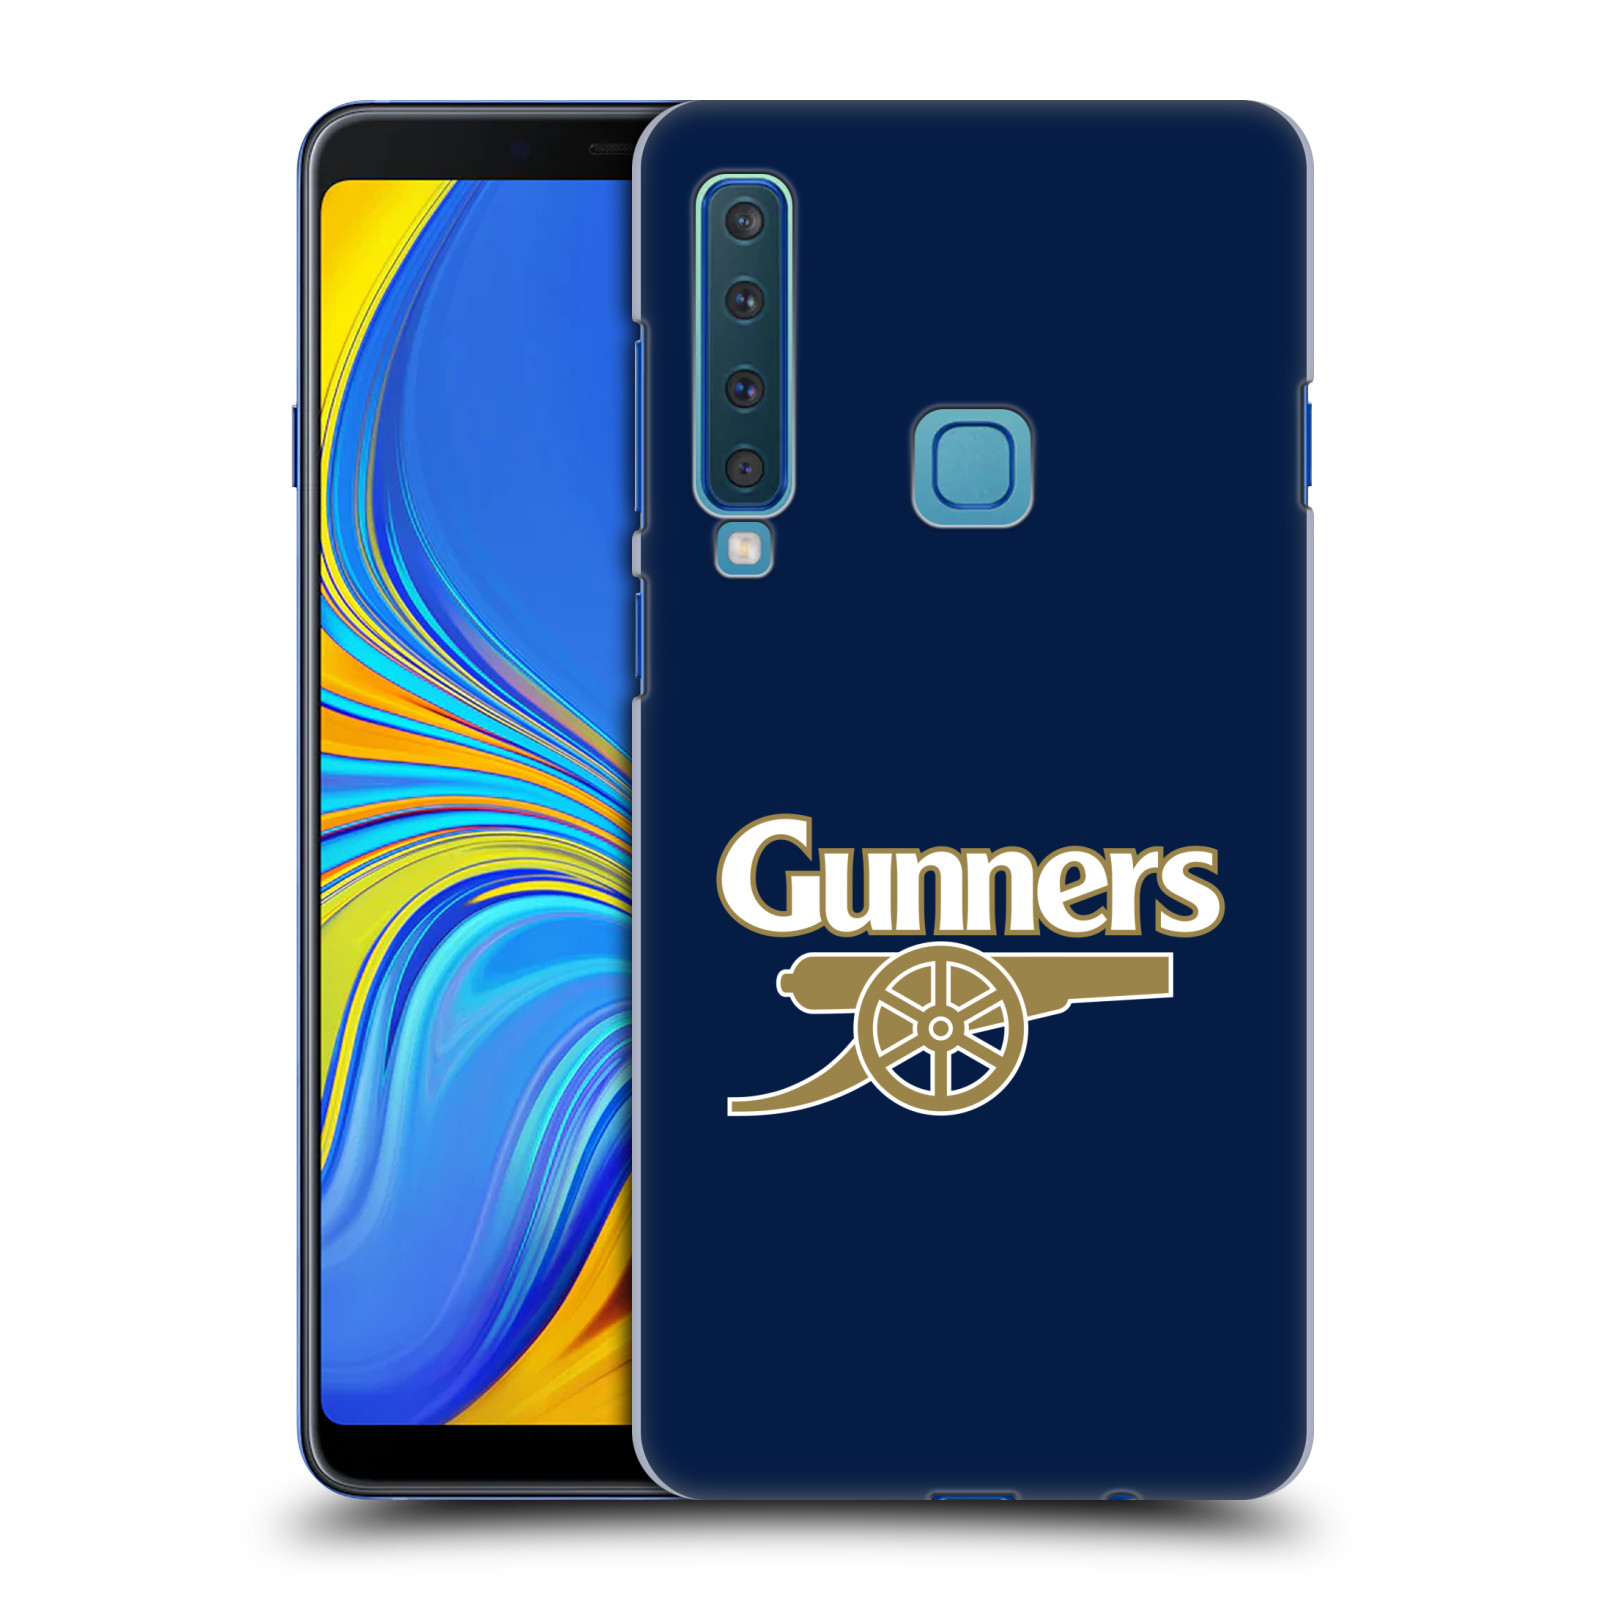 Plastové pouzdro na mobil Samsung Galaxy A9 (2018) - Head Case - Arsenal FC - Gunners